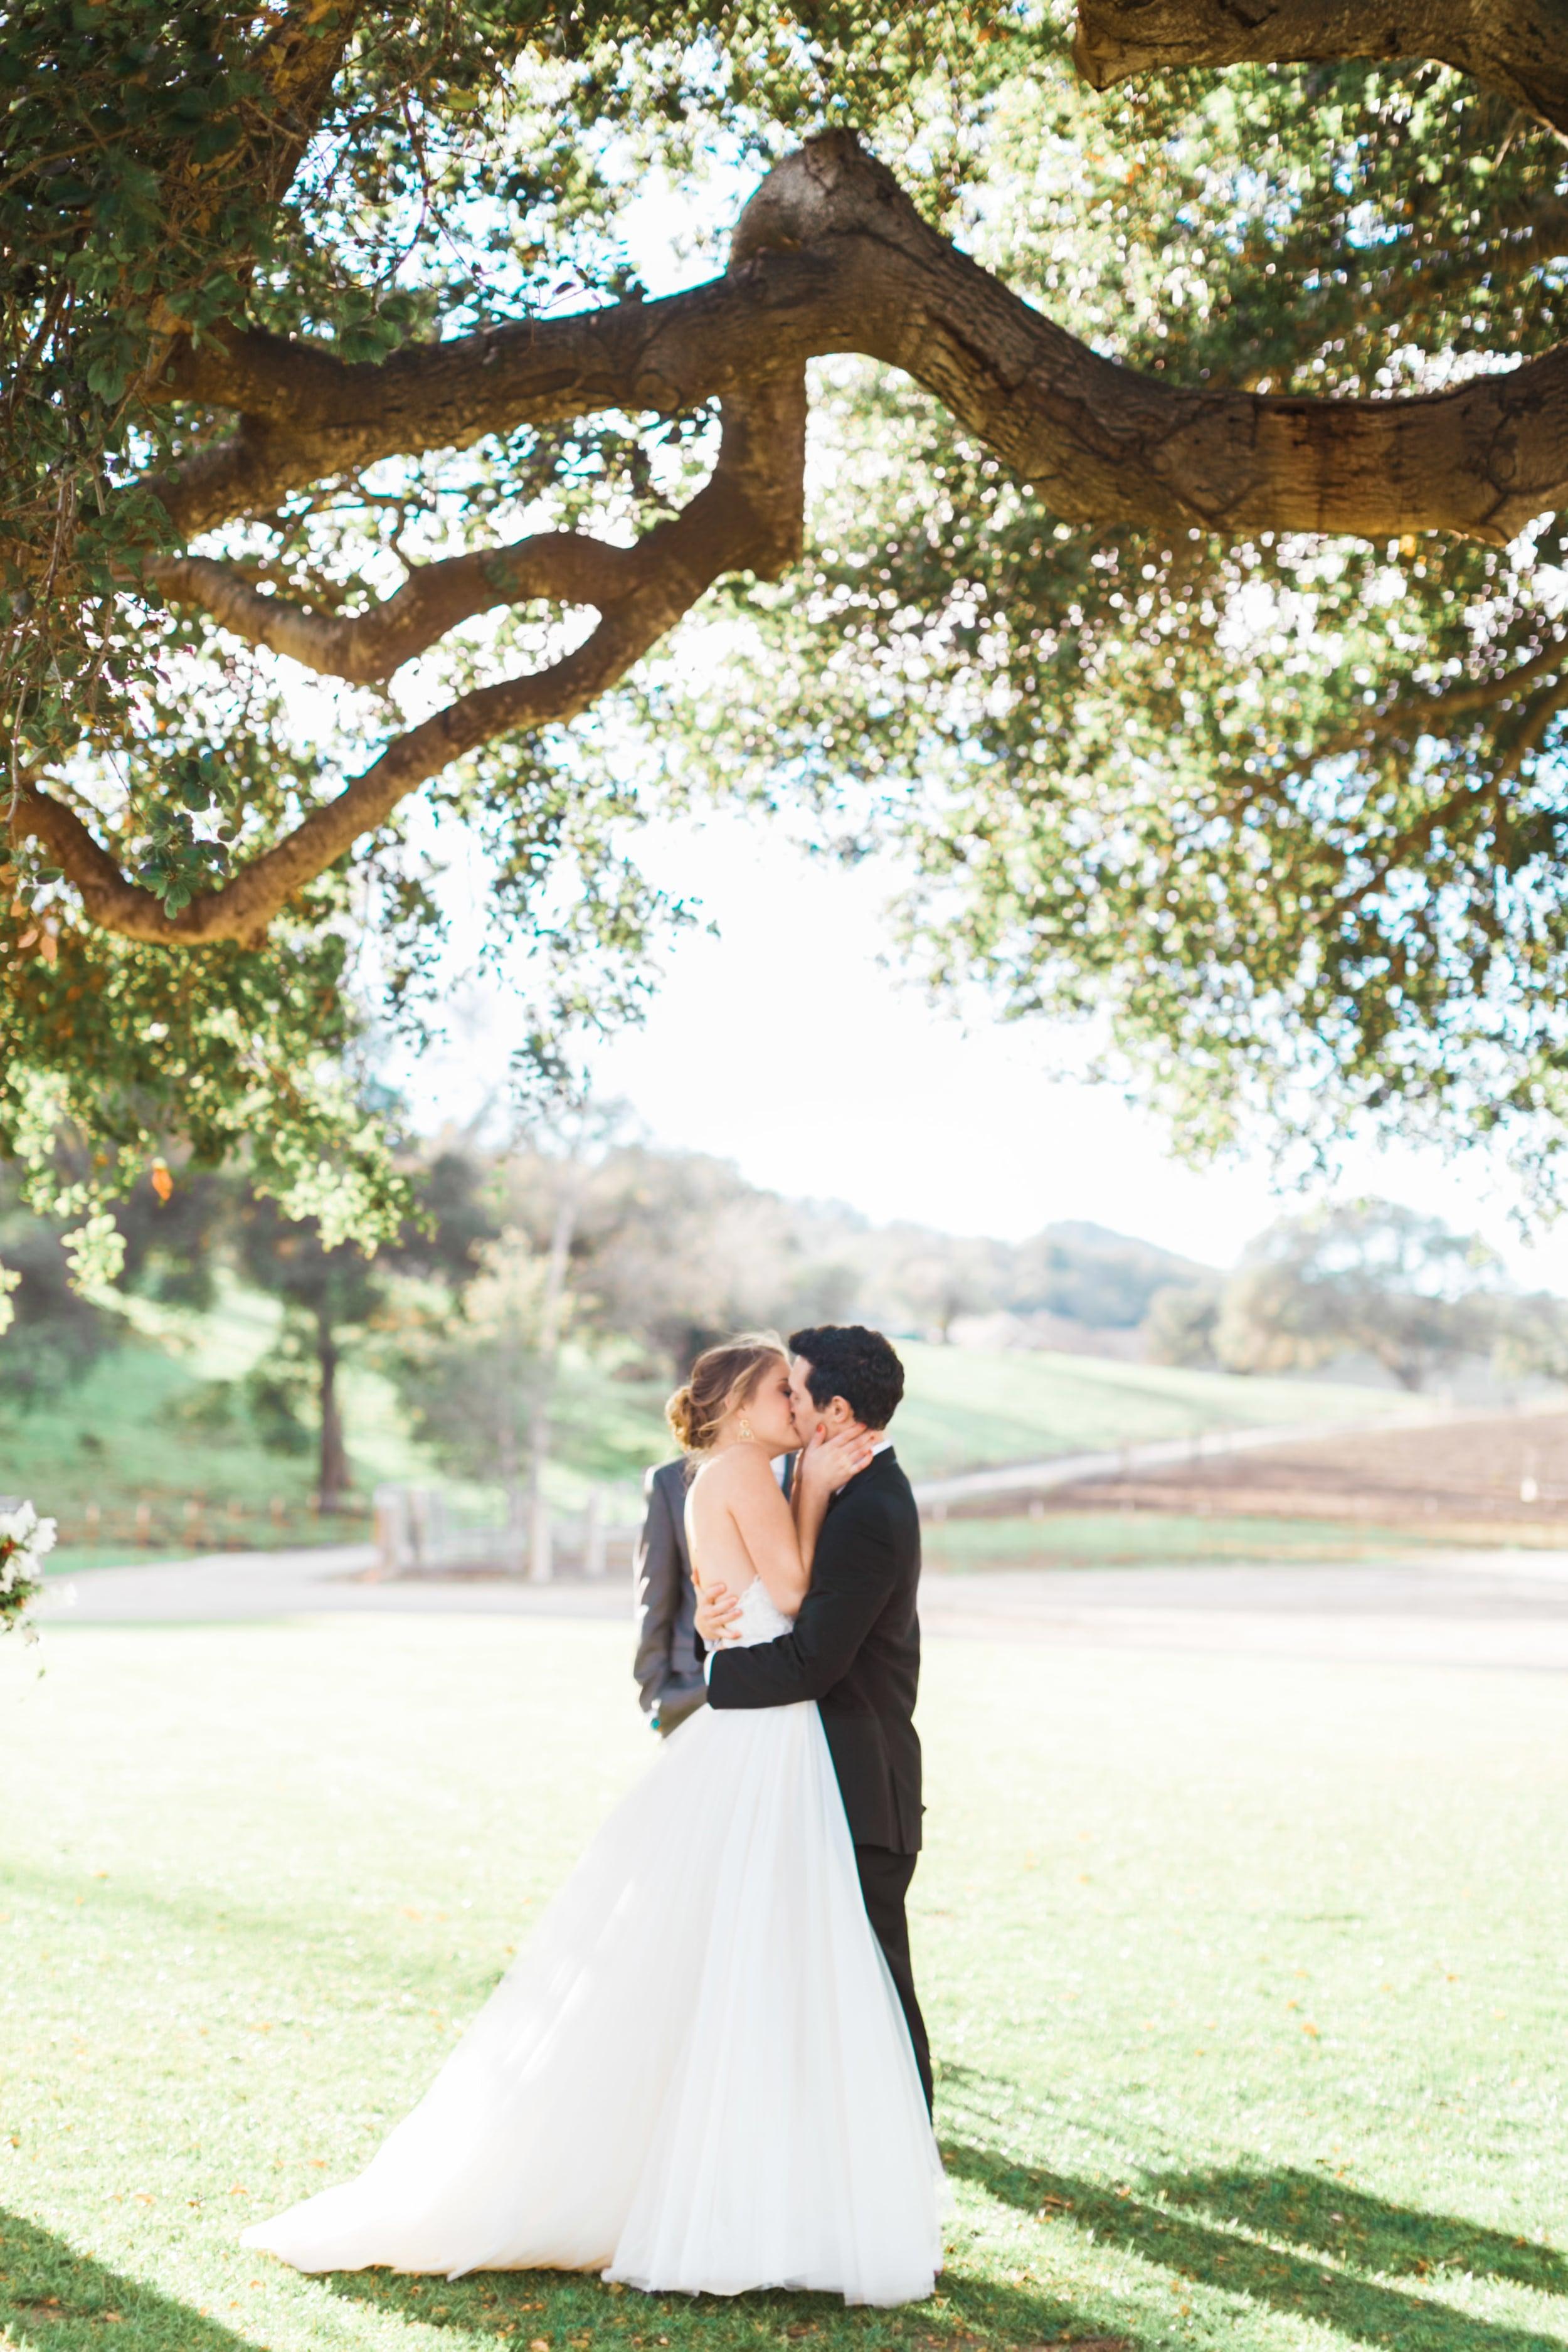 Natalie_Schutt_Photography_Winter_Wedding_San_Luis_Obispo-140.jpg